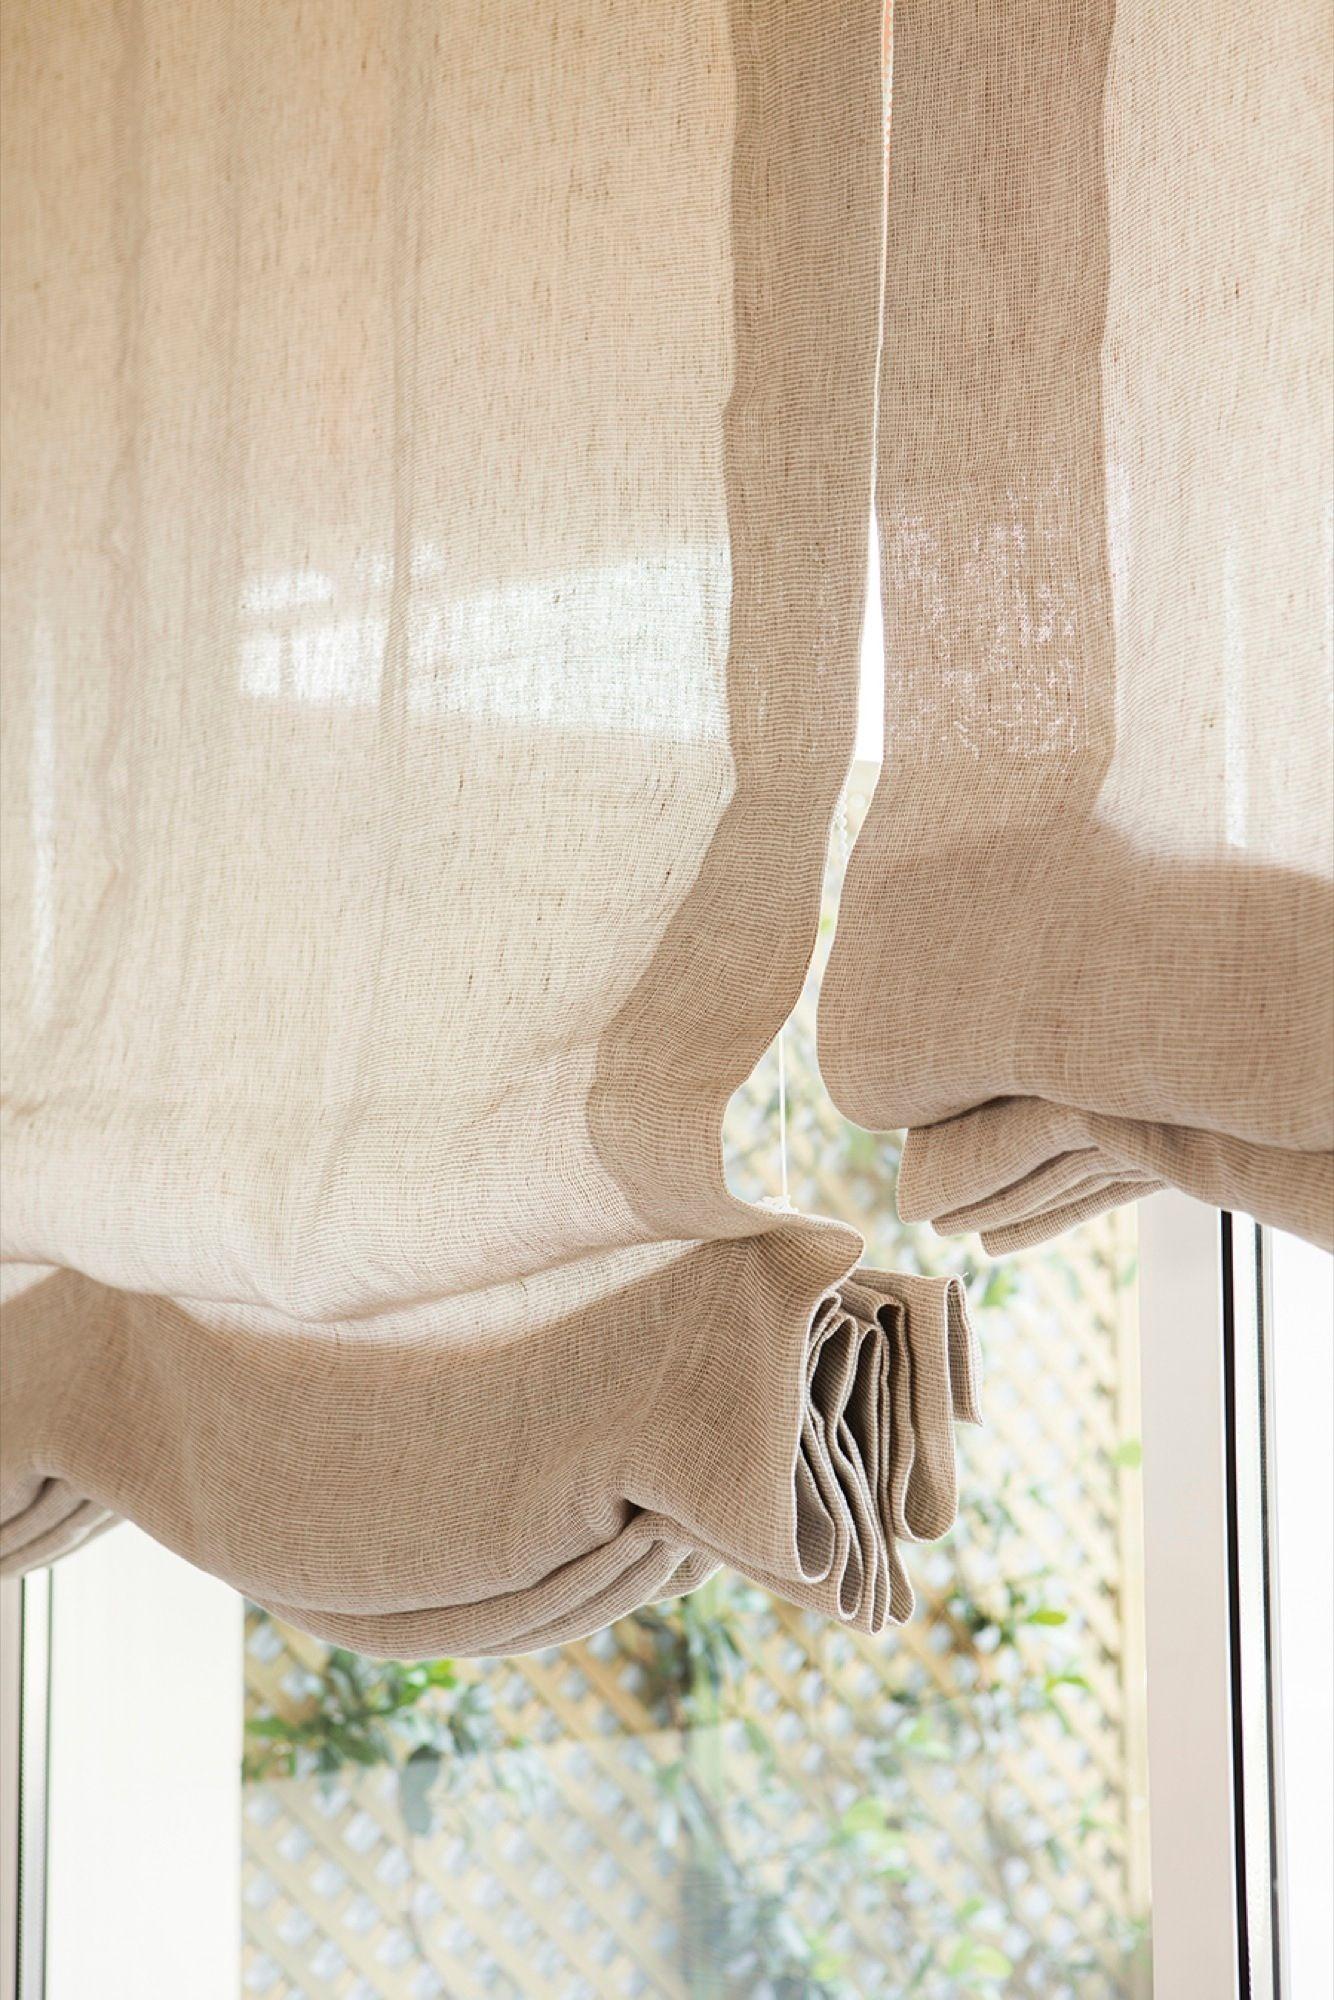 La clave: reutilizar | Summer Living Style & Interiors en ...